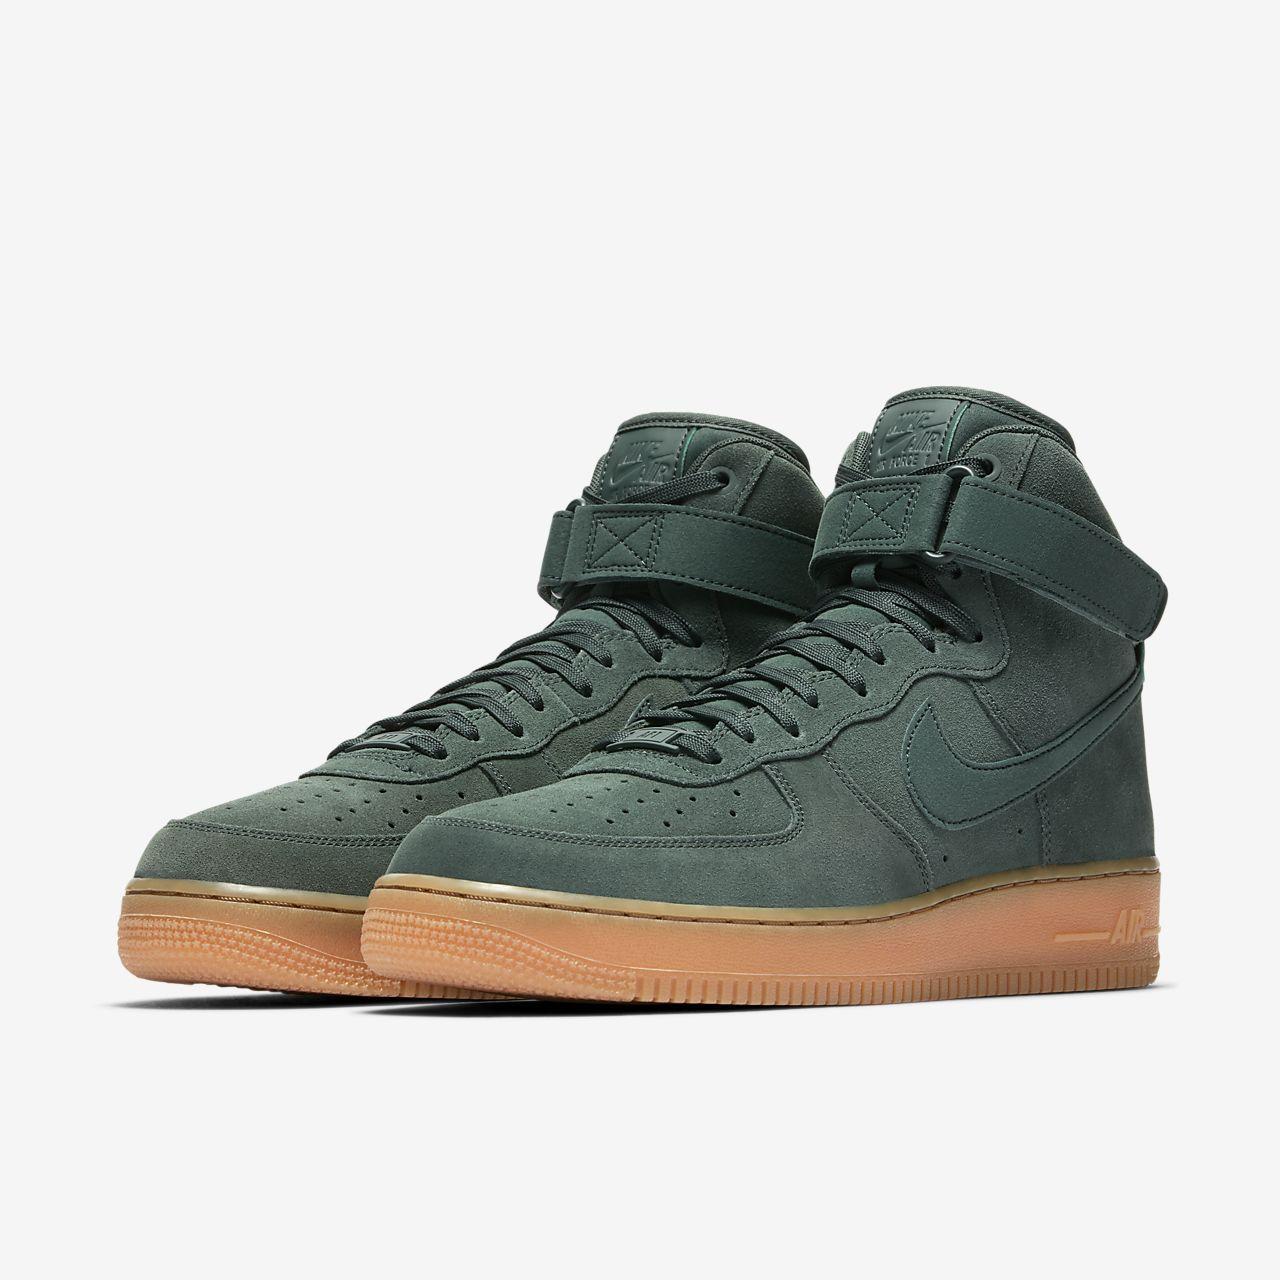 Nike Air Force 1 High '07 LV8 Suede Men's Shoe | Womens